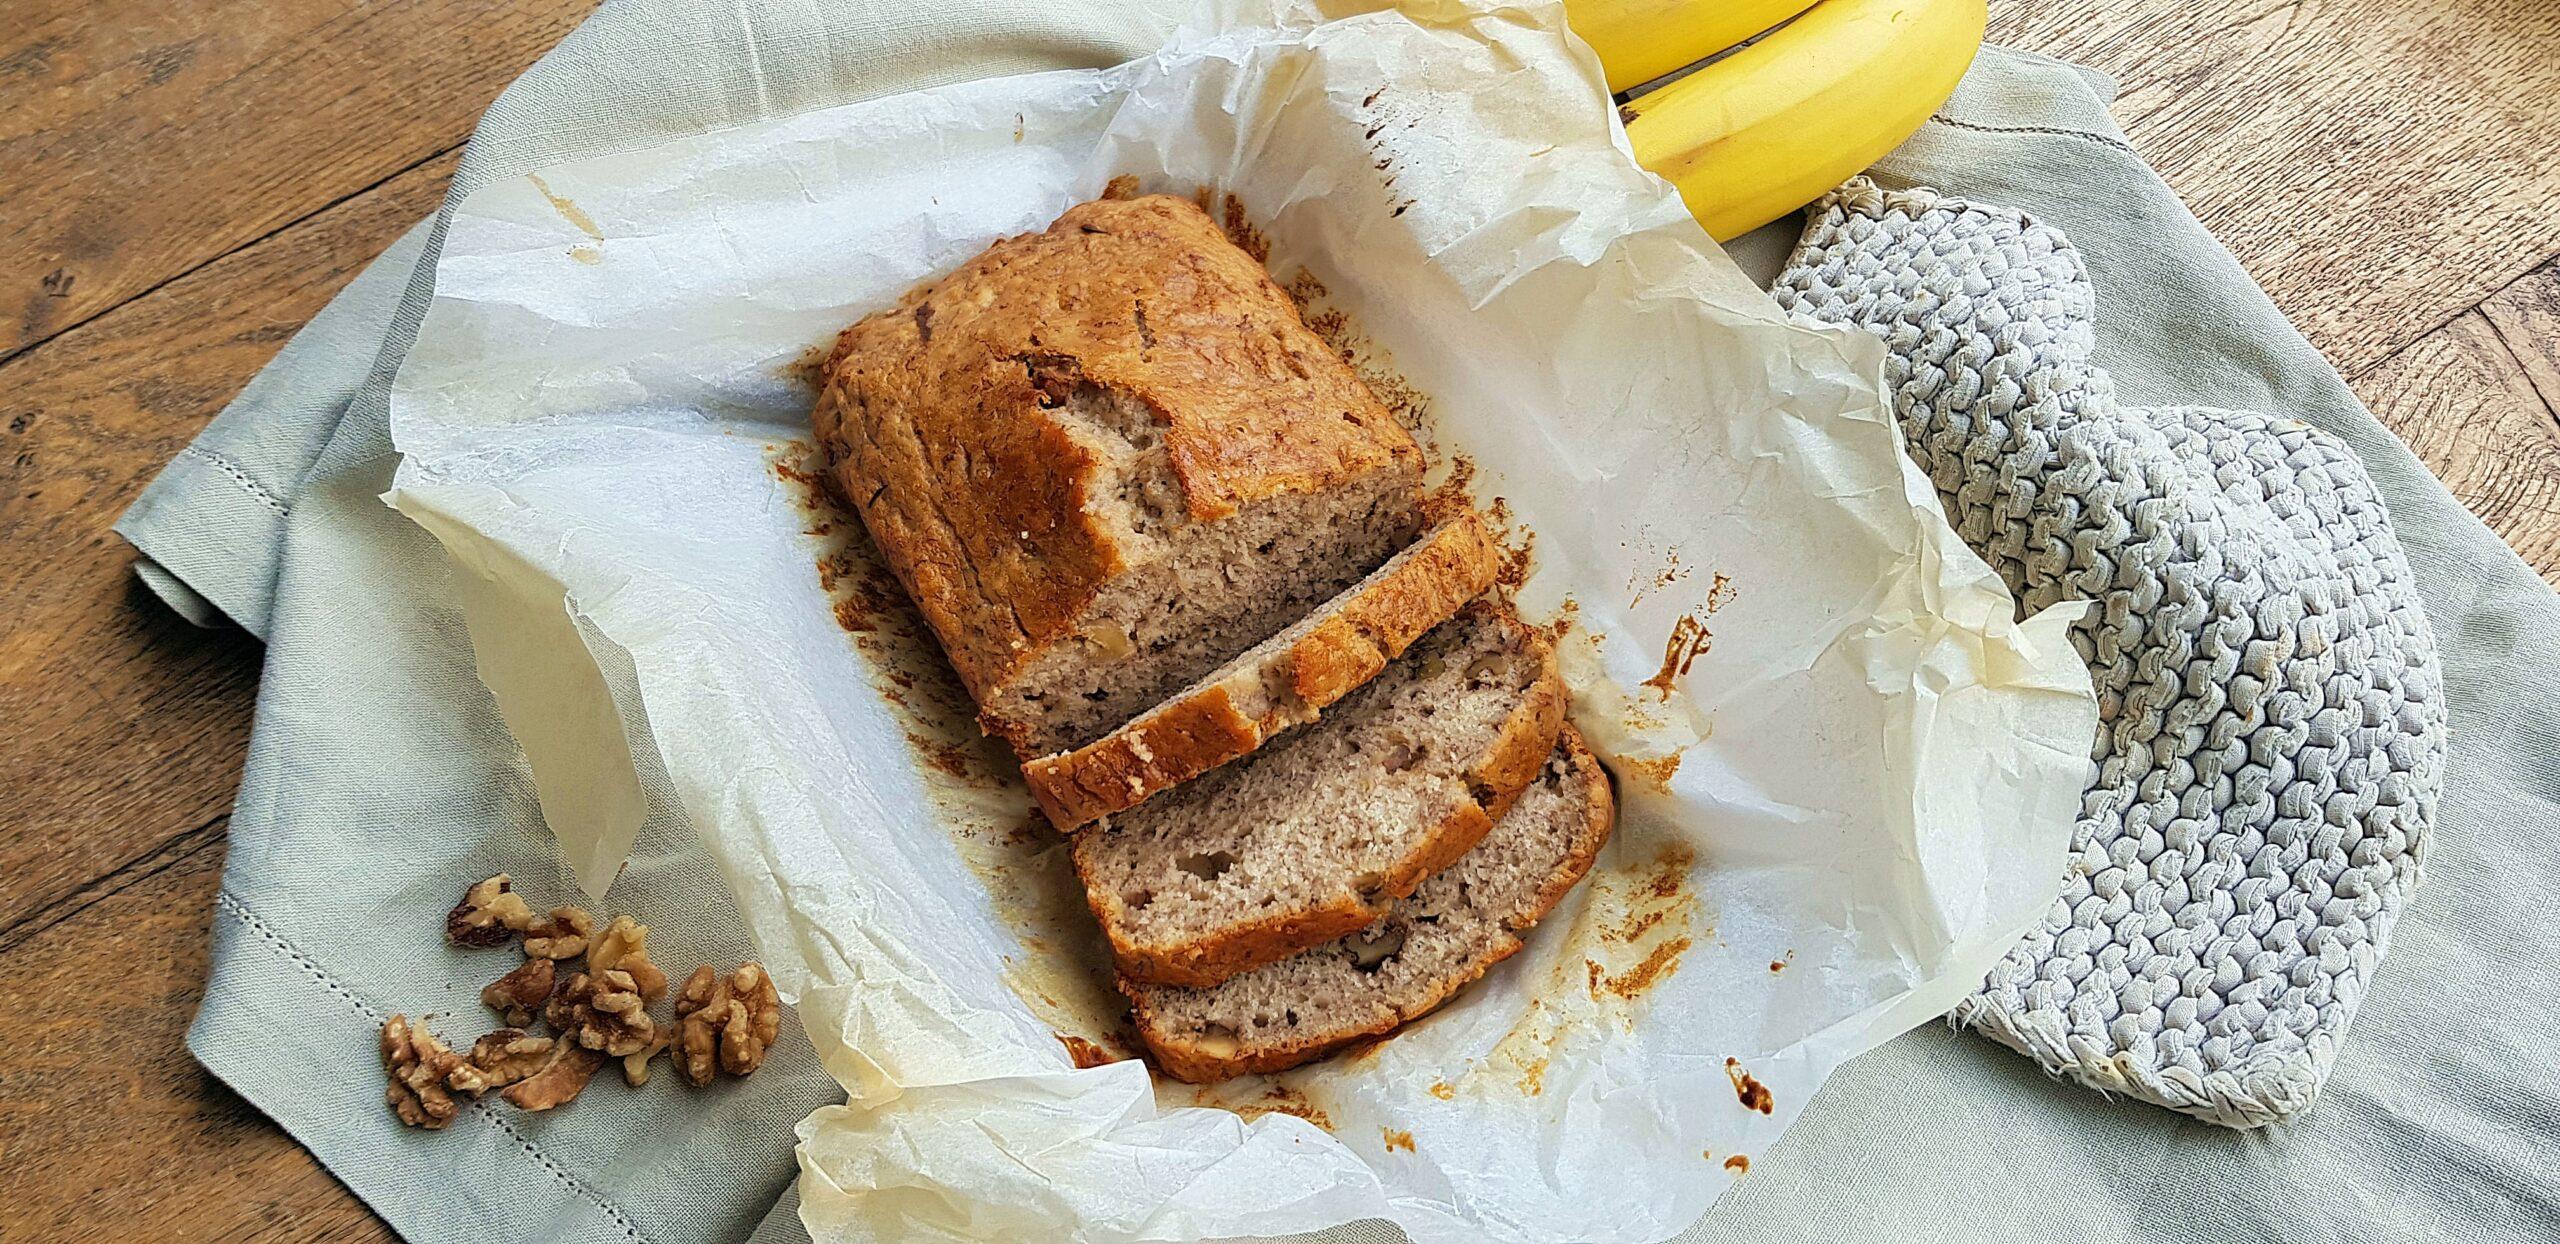 Vegan bananenbrood